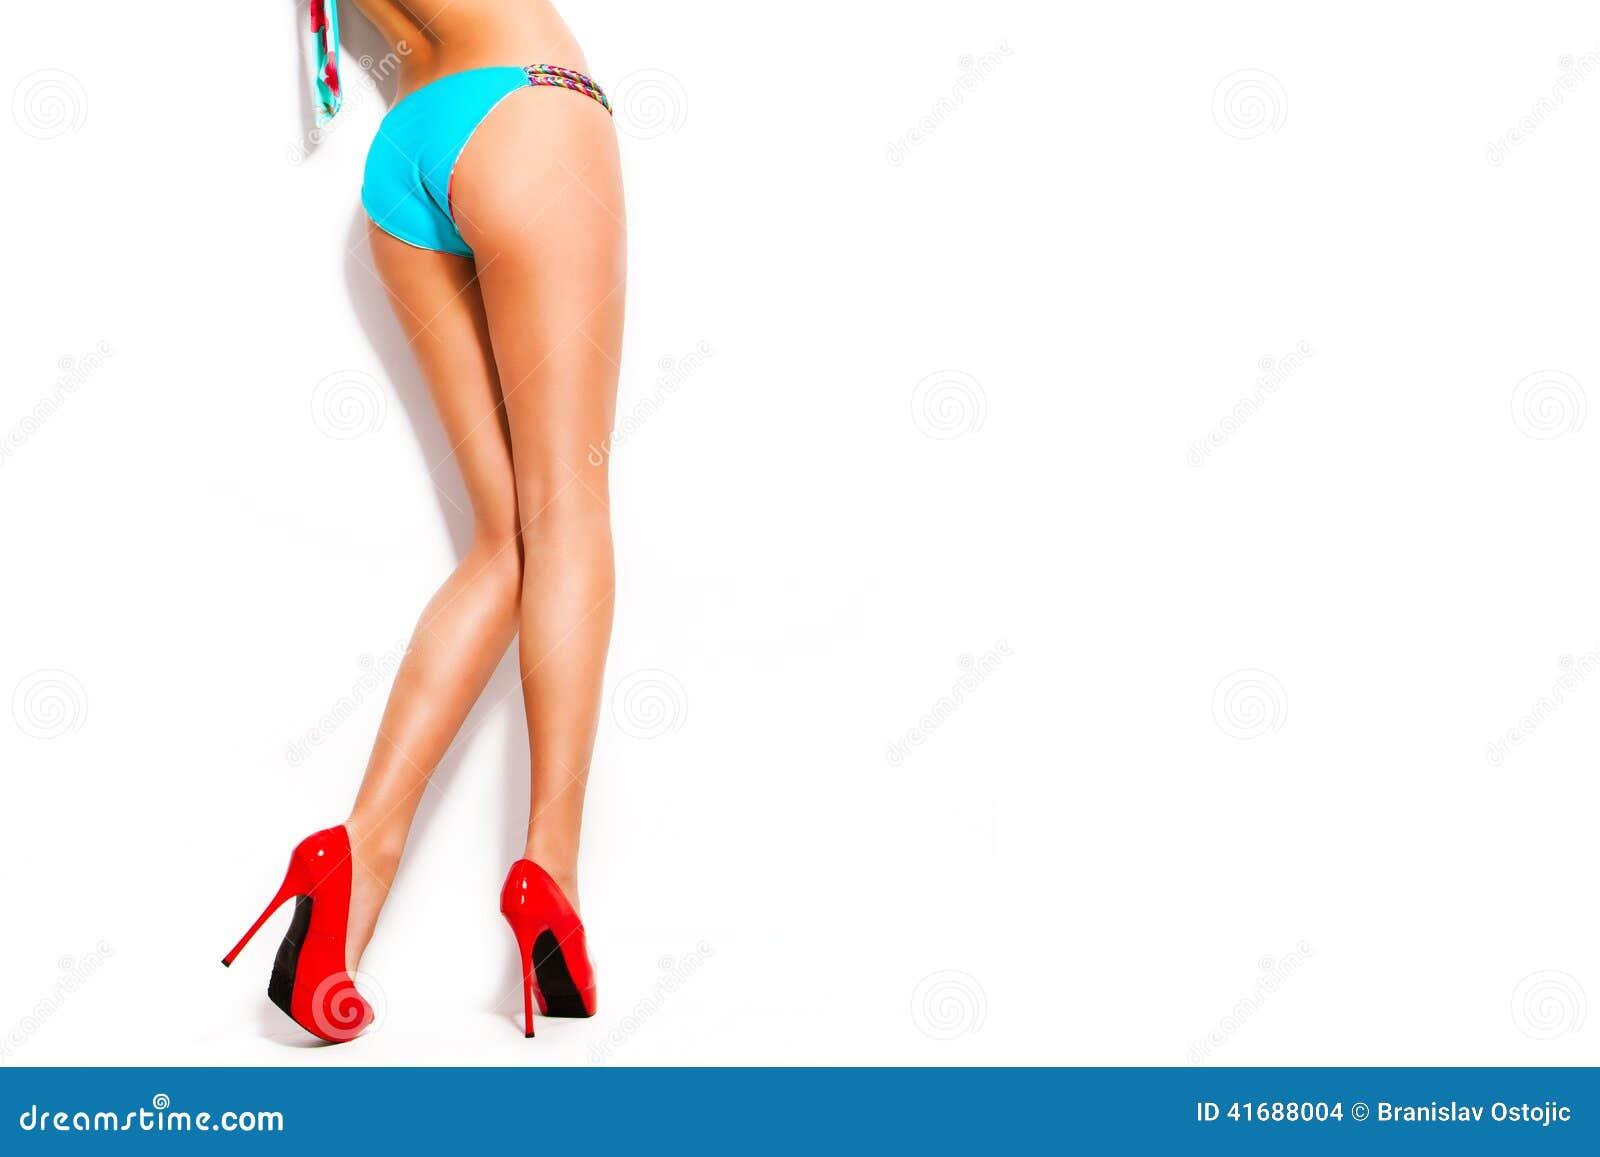 High heel shoes and bikini